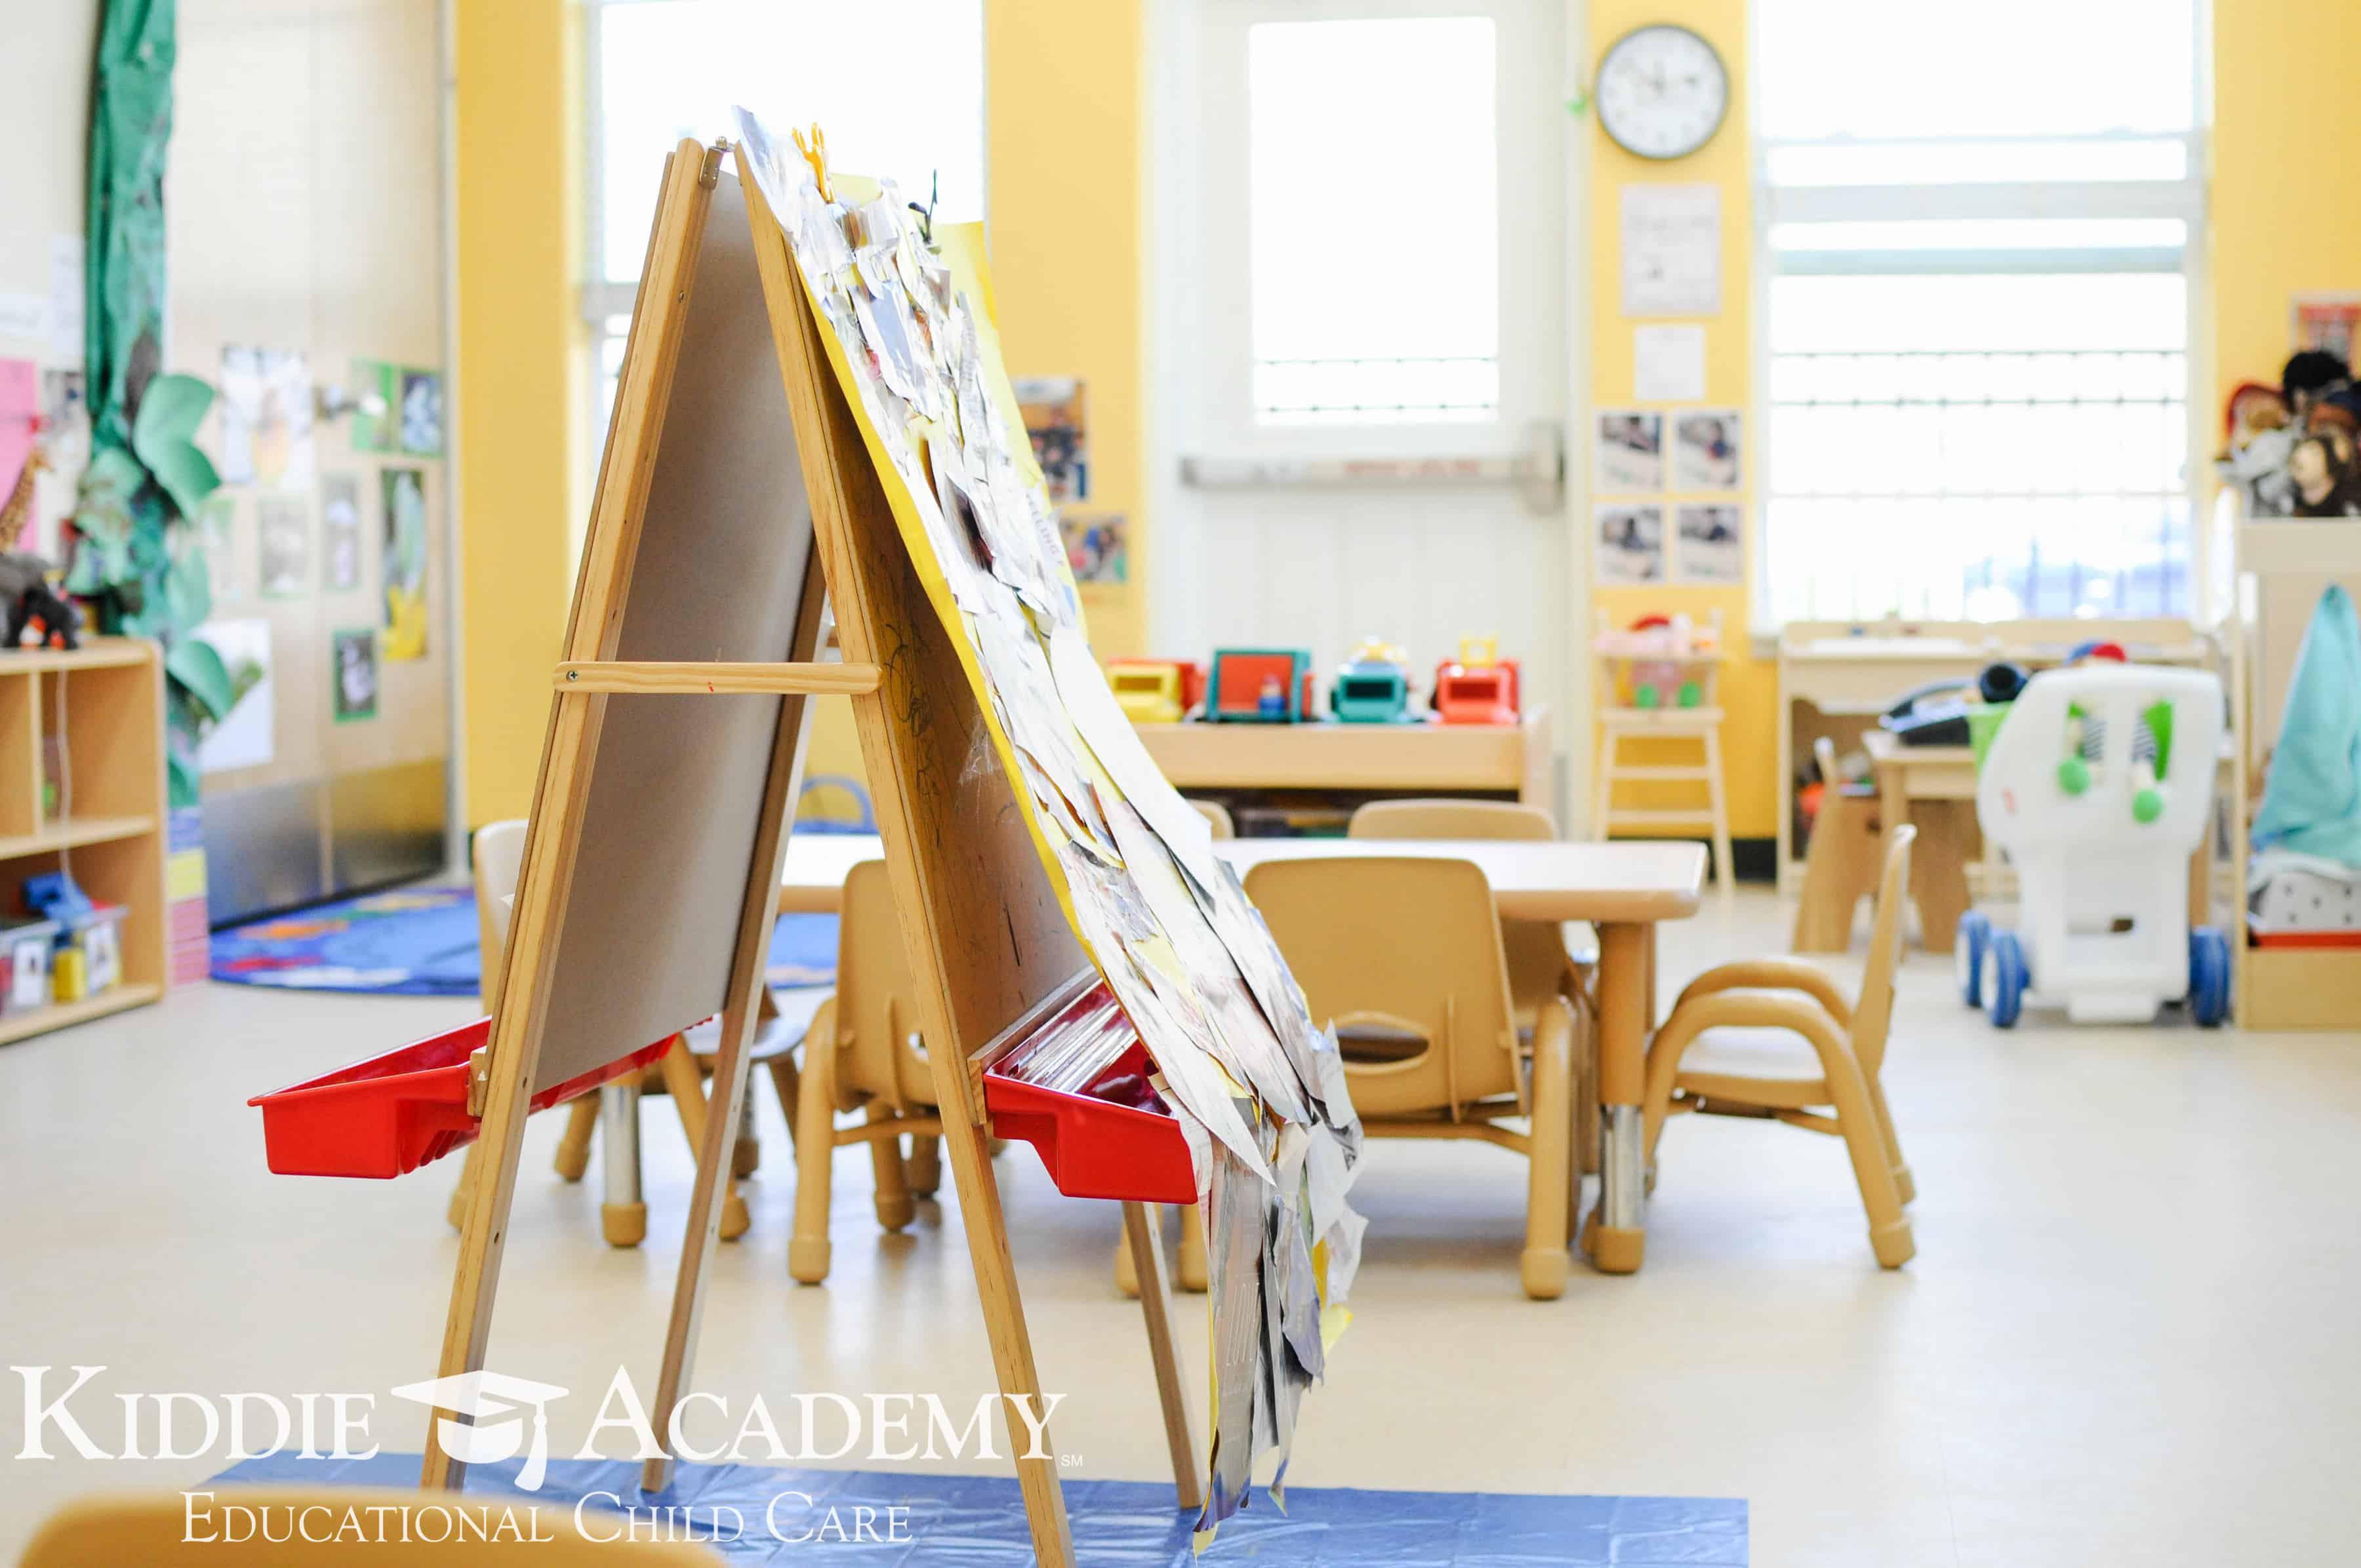 Kiddie Academy Classroom_Art